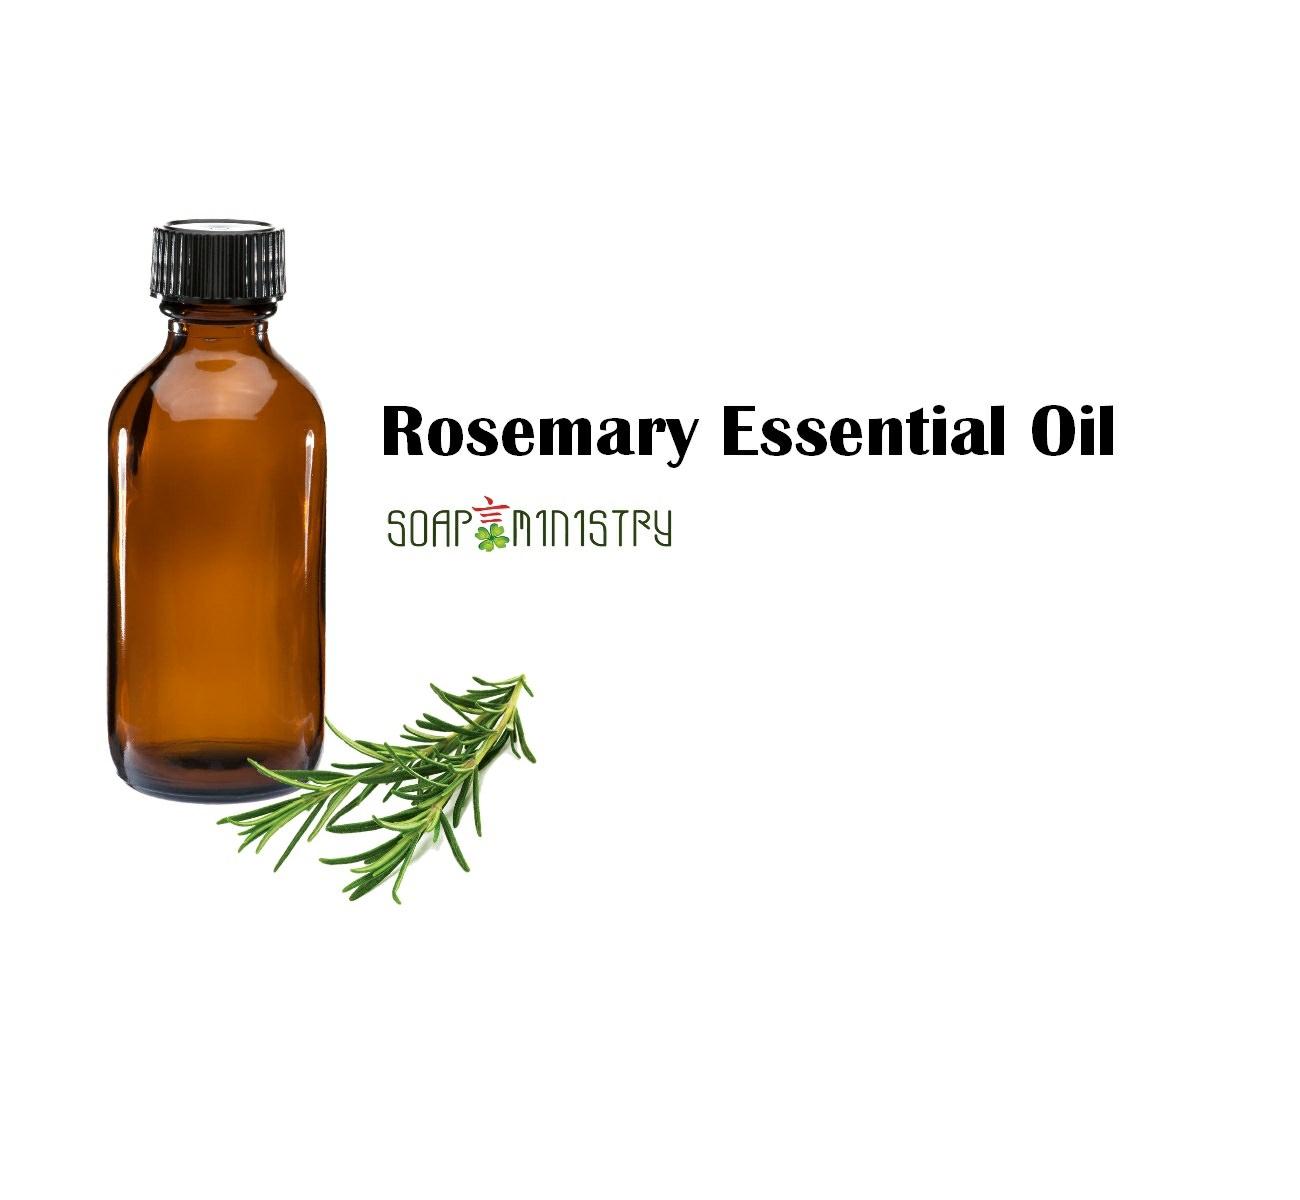 Rosemary Essential Oil 100ml